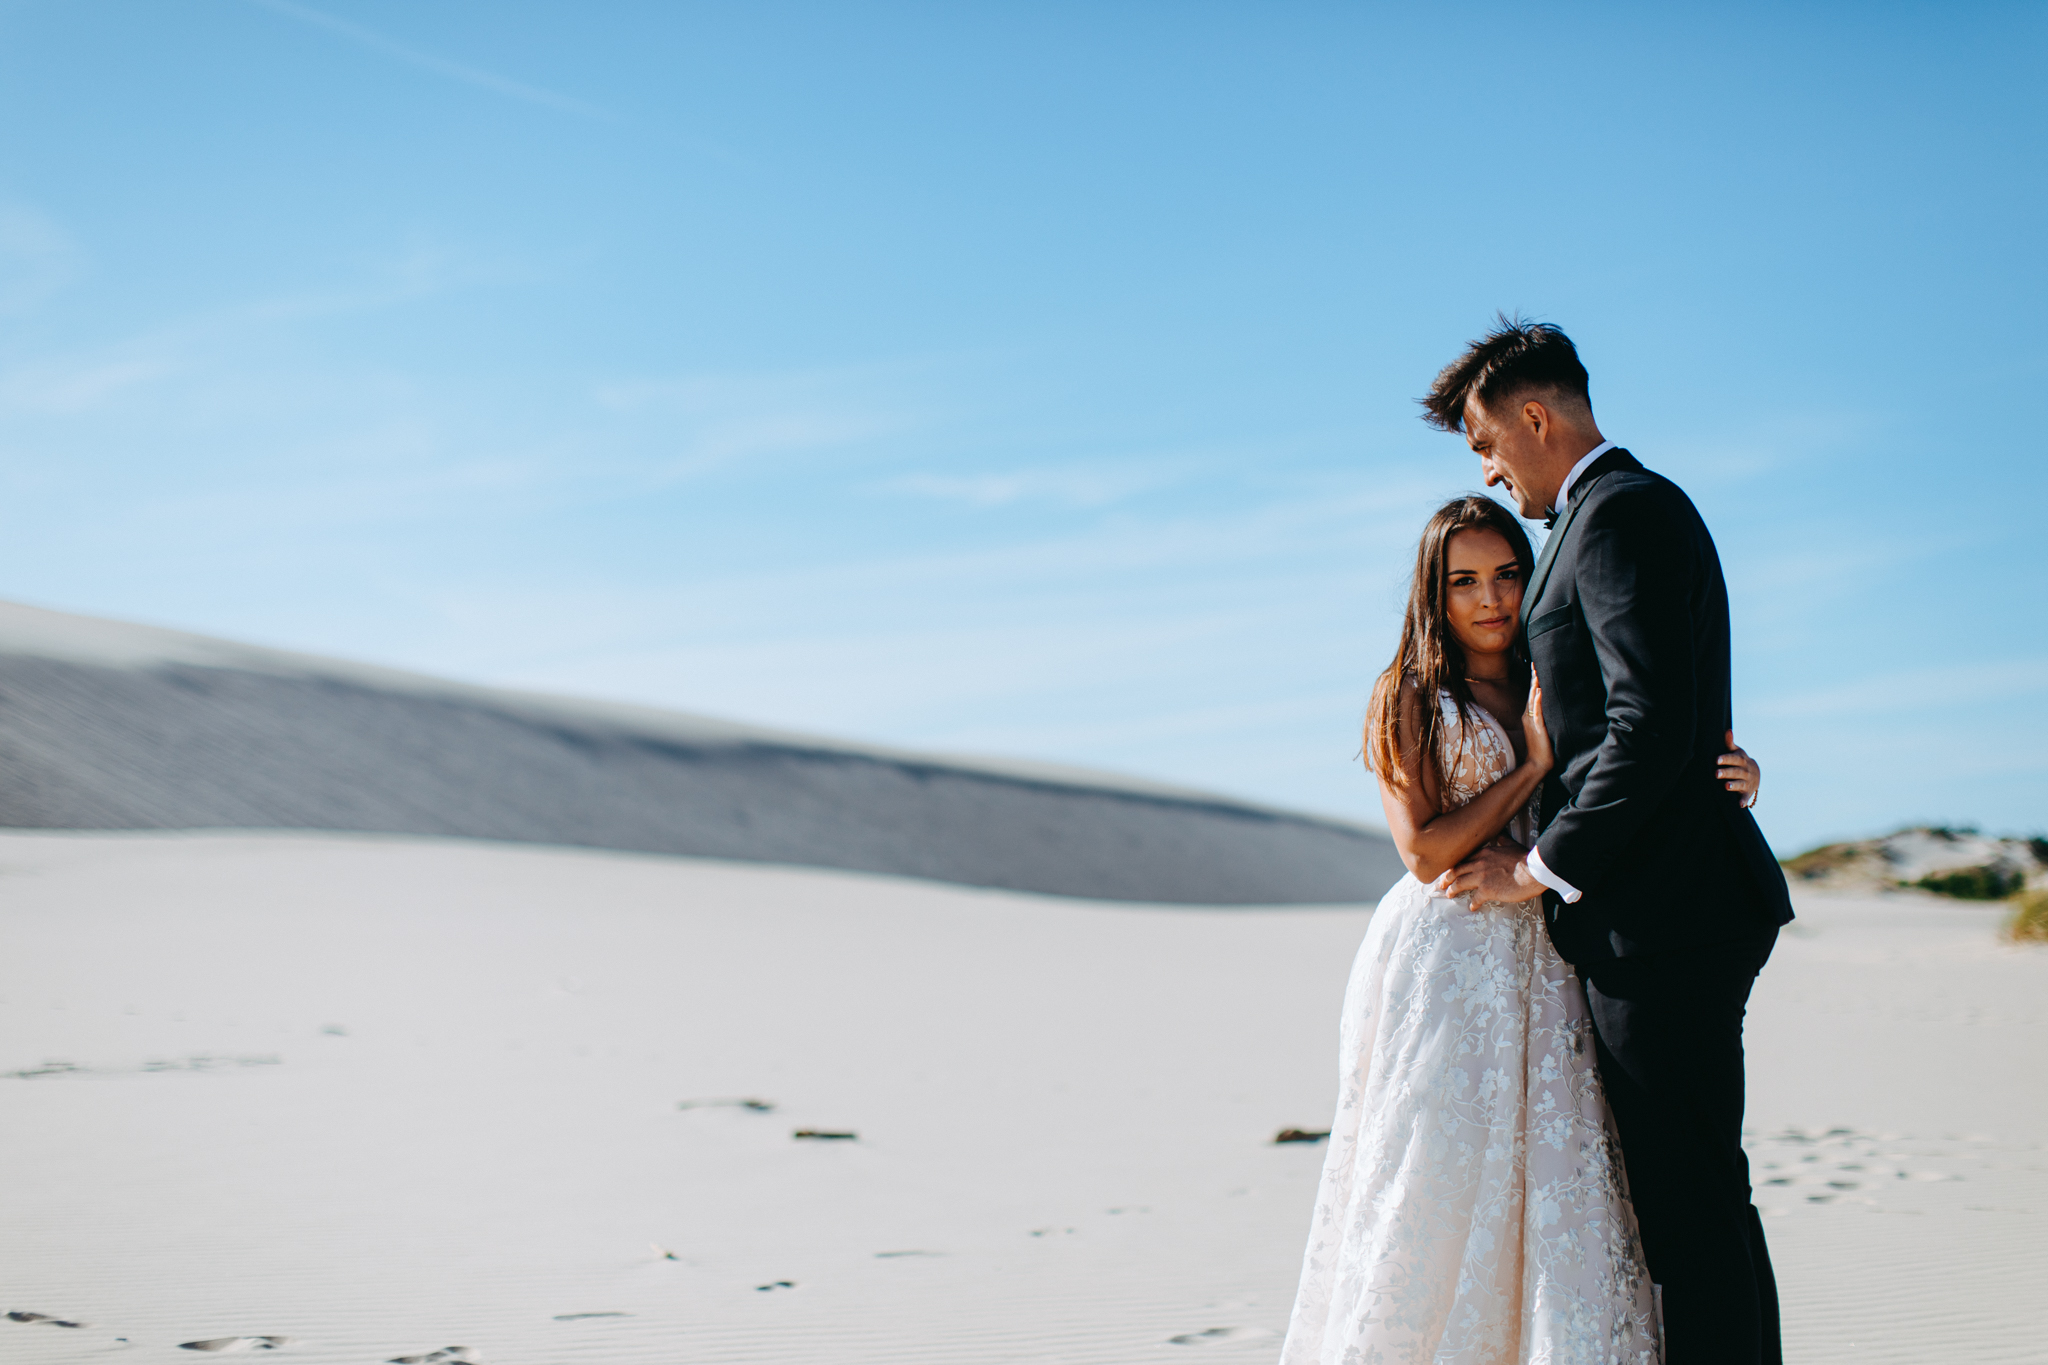 Sesja Ślubna – W Morzu Piasku